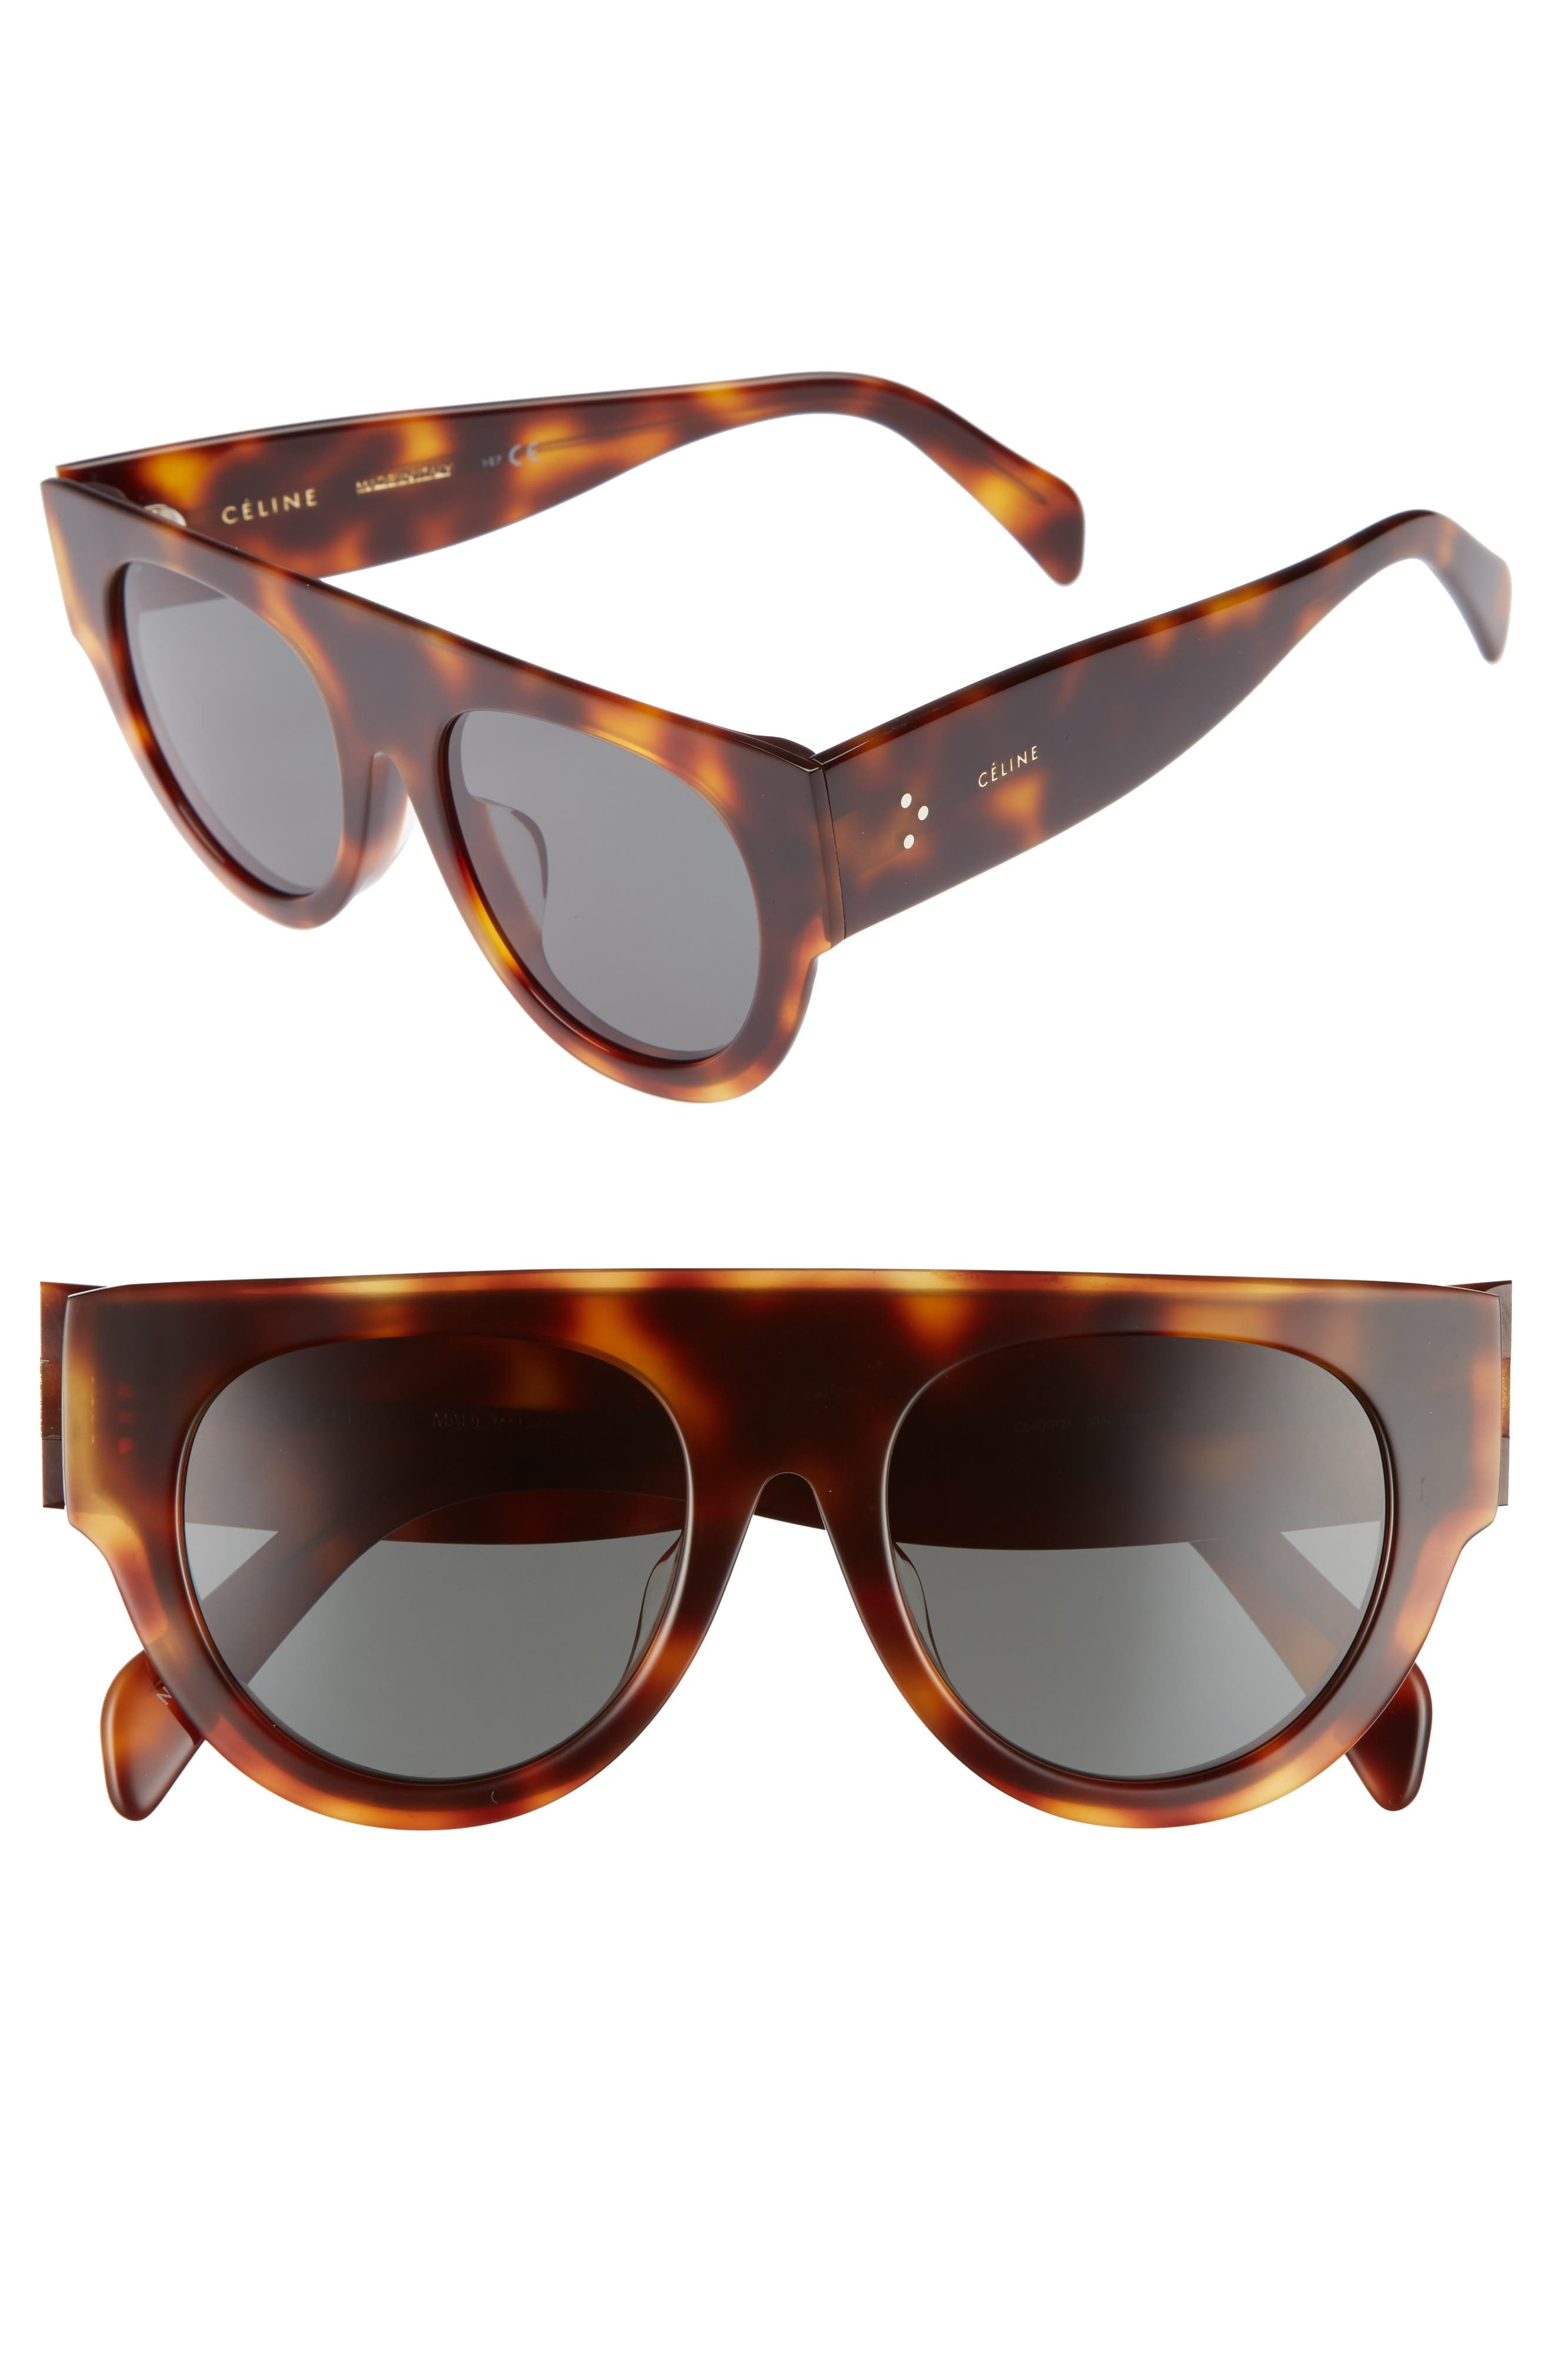 52mm Pilot Sunglasses,                             Main thumbnail 1, color,                             Blonde Havana/ Green